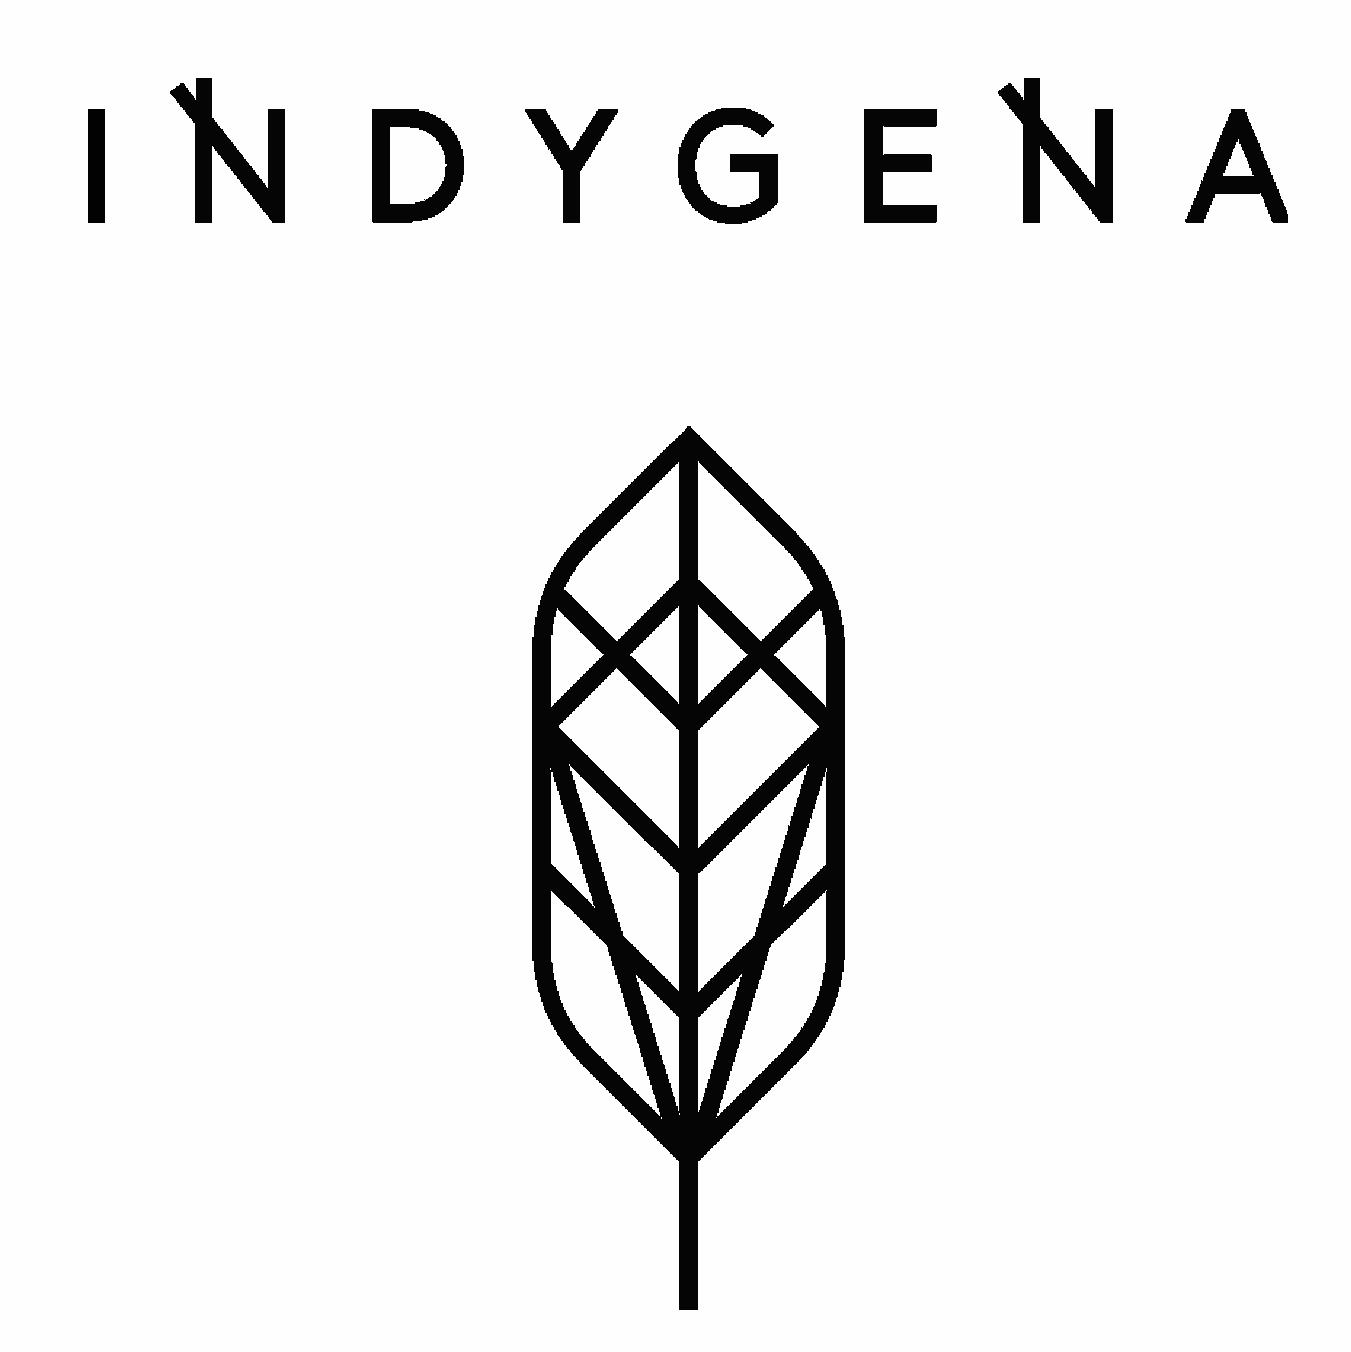 Original roots. Honest purpose. Modern design. We are INDYGENA ...